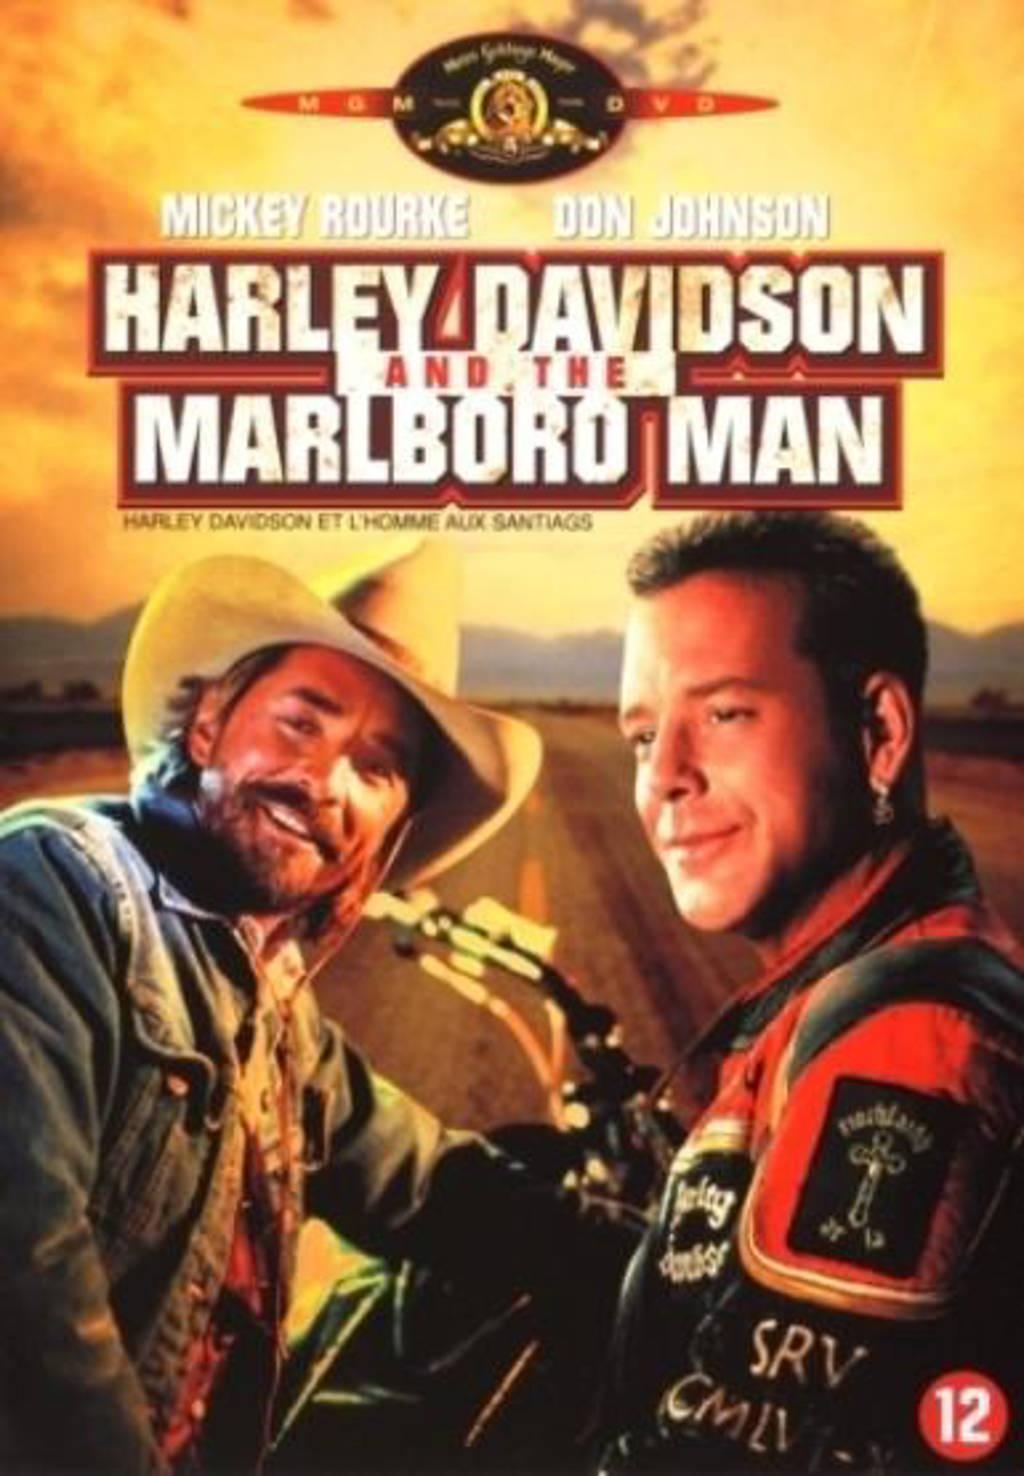 Harley Davidson and the marlboro man (DVD)